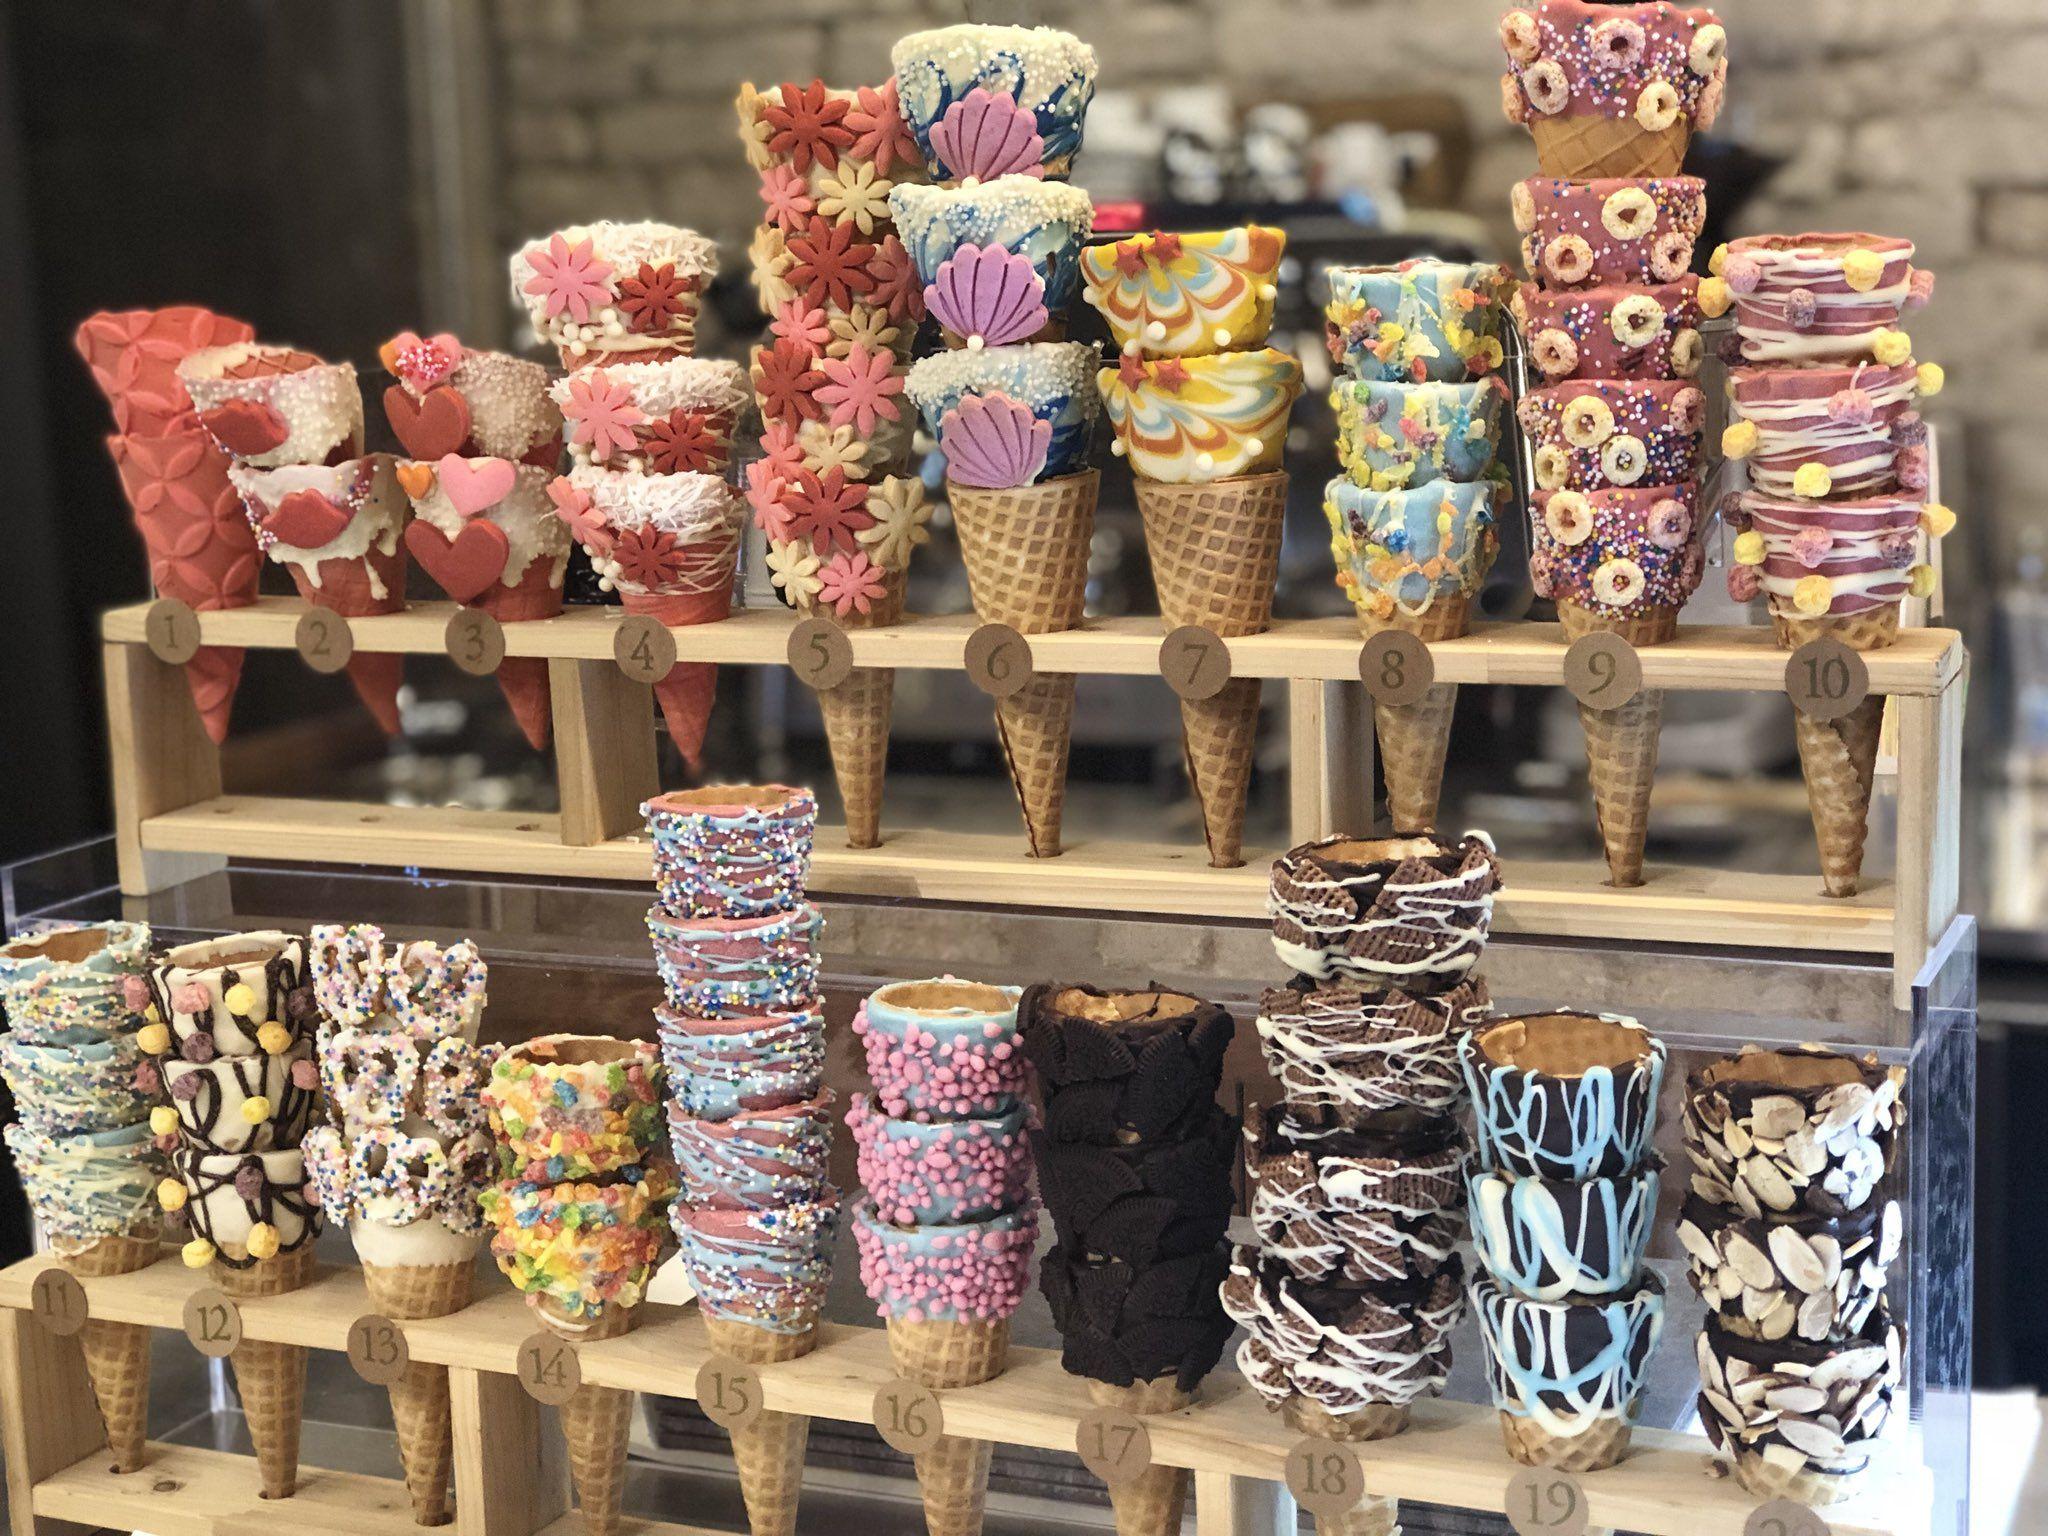 Park Art My WordPress Blog_Ice Cream Maker Joseph Last Name